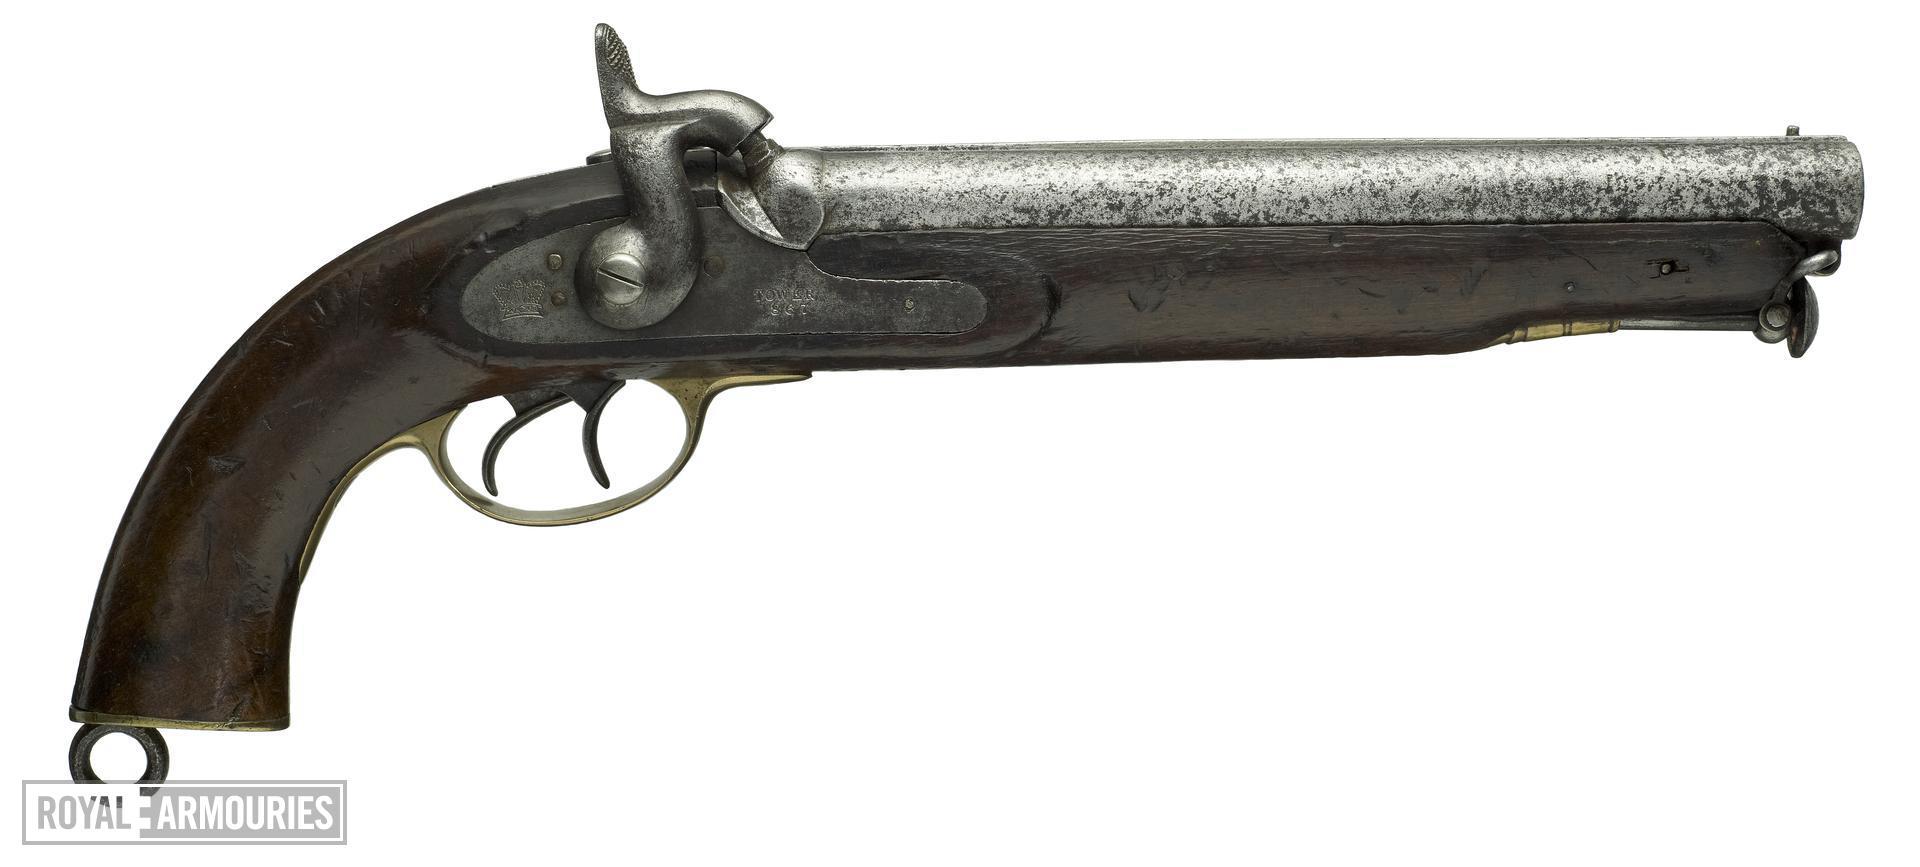 Percussion double-barrelled pistol